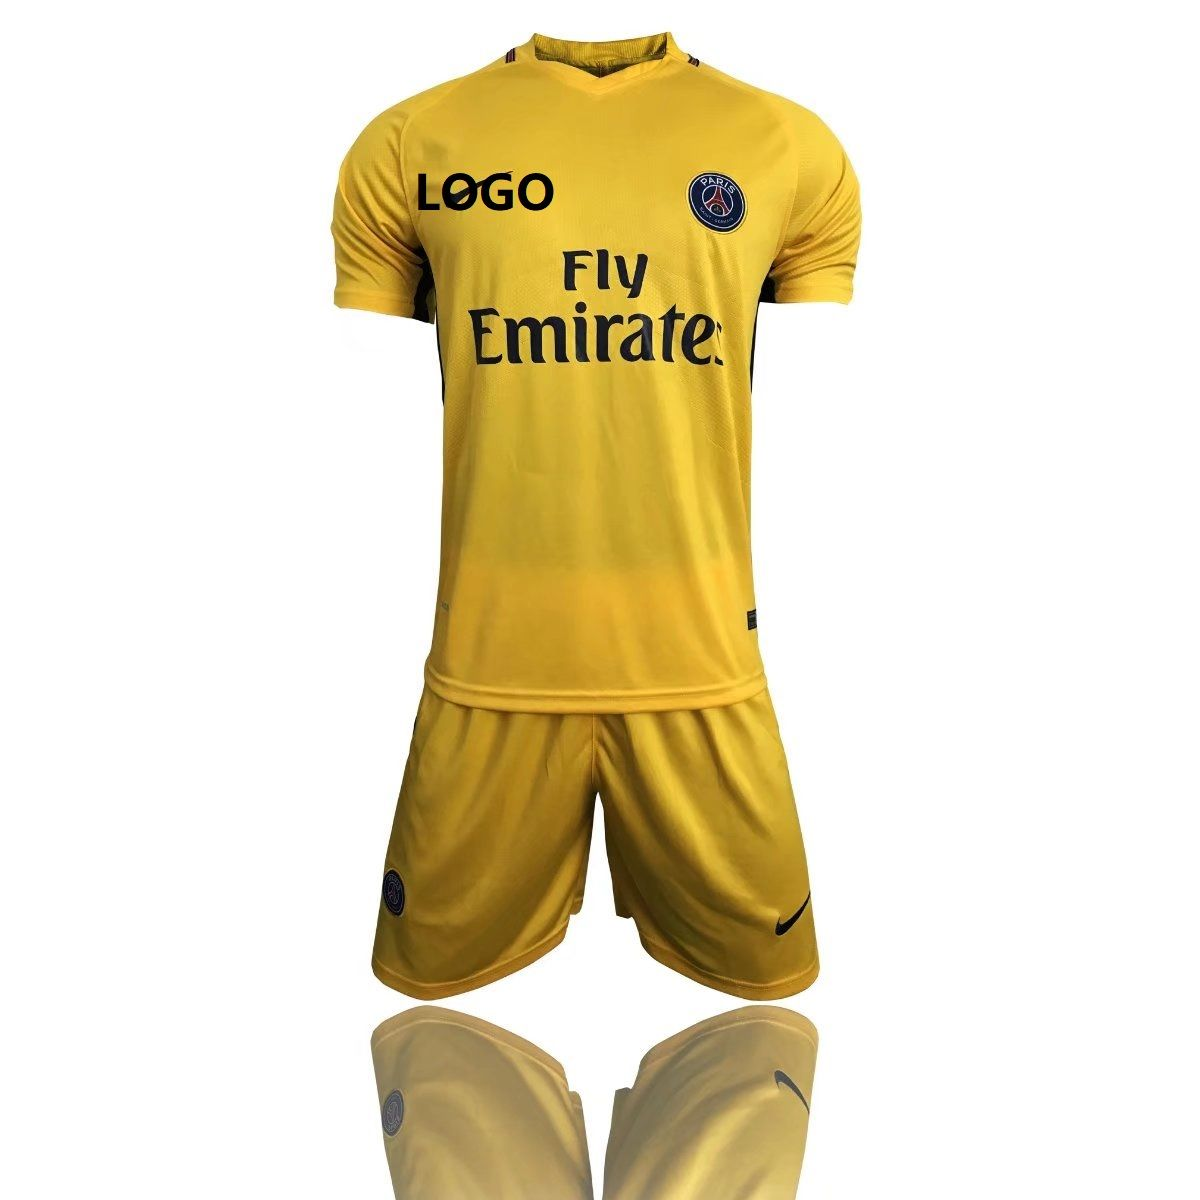 d51302234 17 18 Adult PSG Away Paris Yellow Jersey Uniforms Complete Football Kits Men  Sets